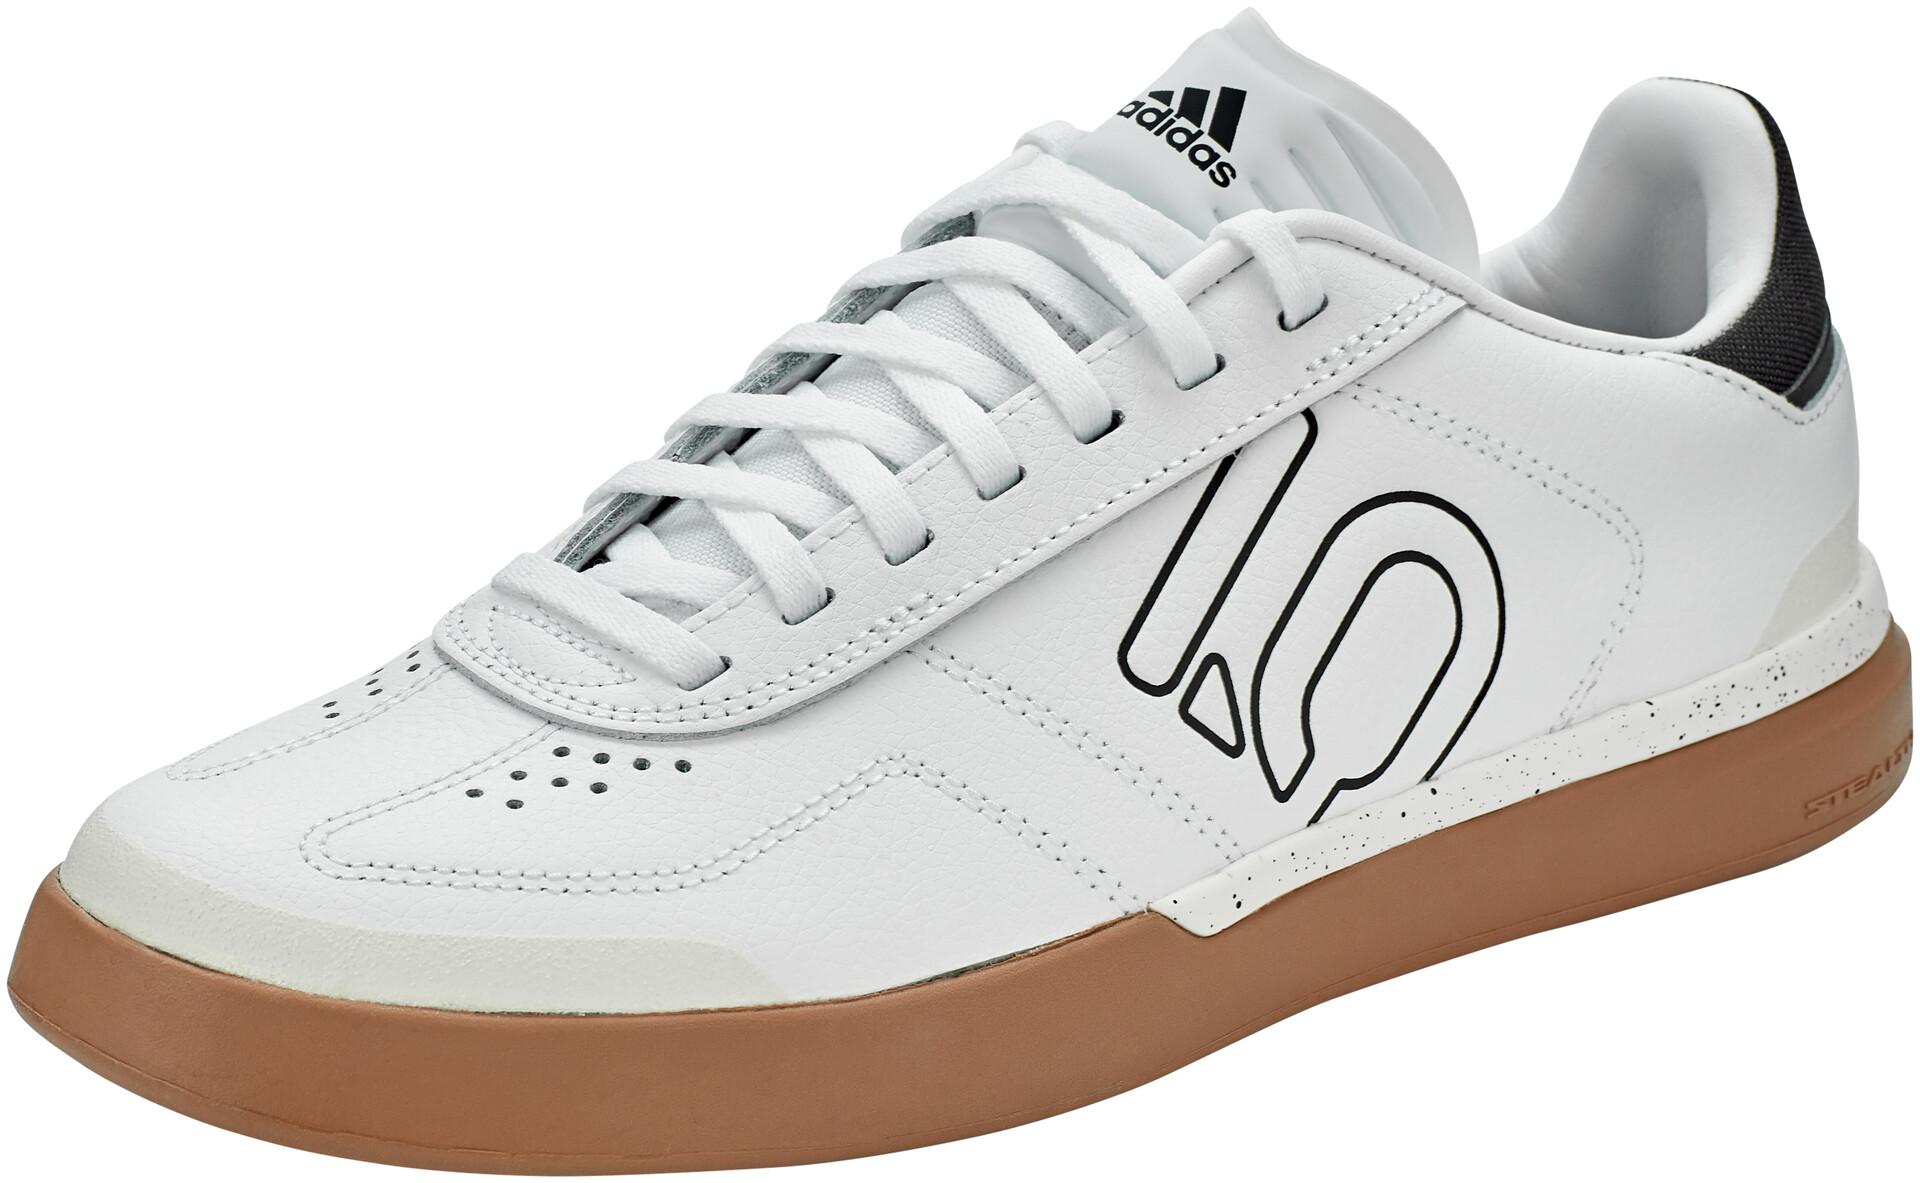 adidas Five Ten Sleuth DLX Mountain Bike Shoes Men footwear white/core black/gum M2